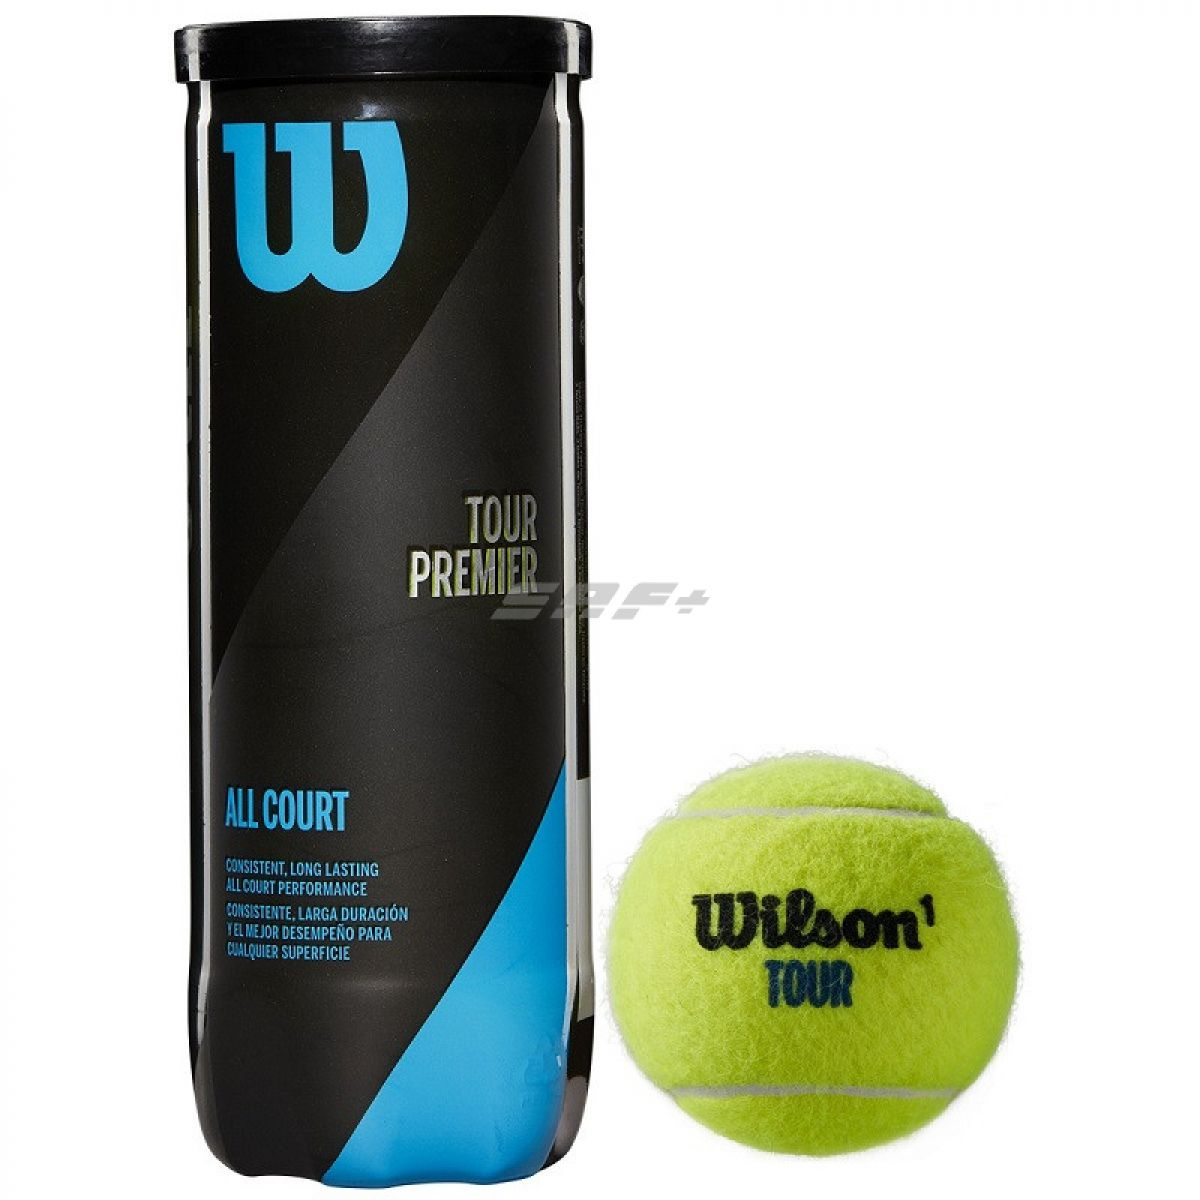 Мяч теннисный Мяч теннисный WILSON Tour Premier All Court арт. WRT109400, одобр.ITF, фетр, нат.резина,. уп.3 шт